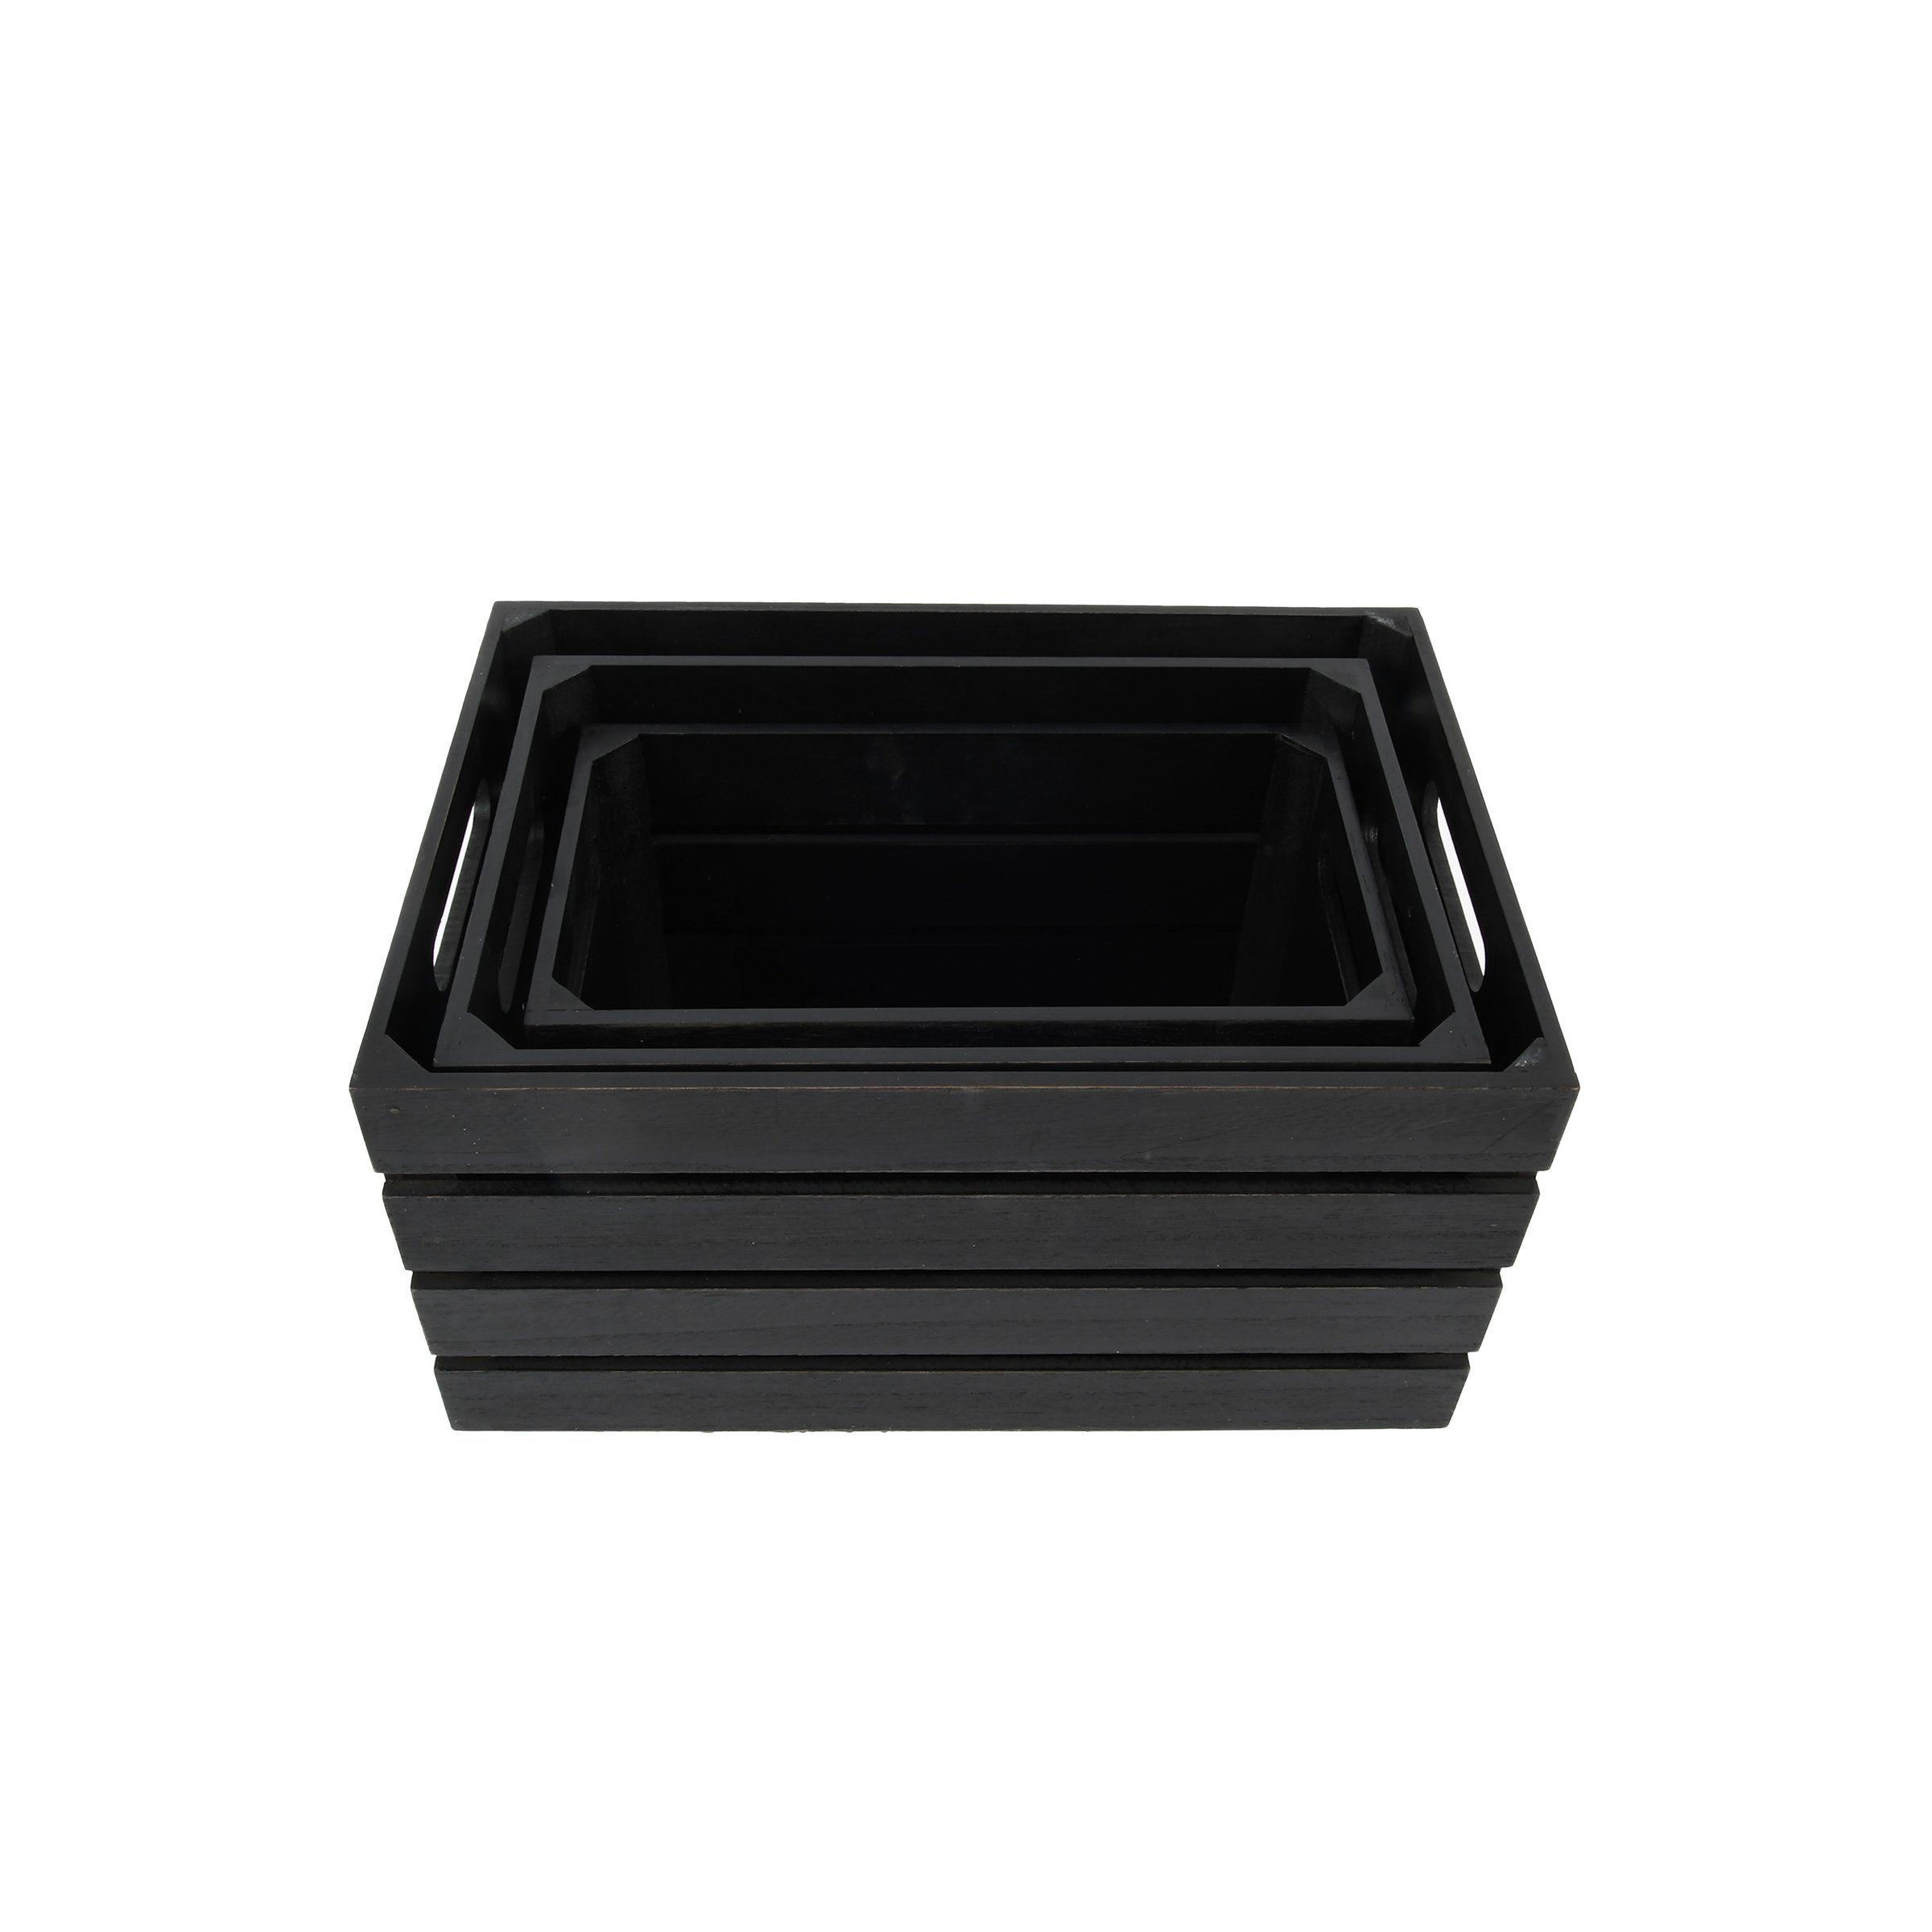 Photo of Distressed Black 13.4'W x 9.5'H Nesting Storage Crates, Set of Three